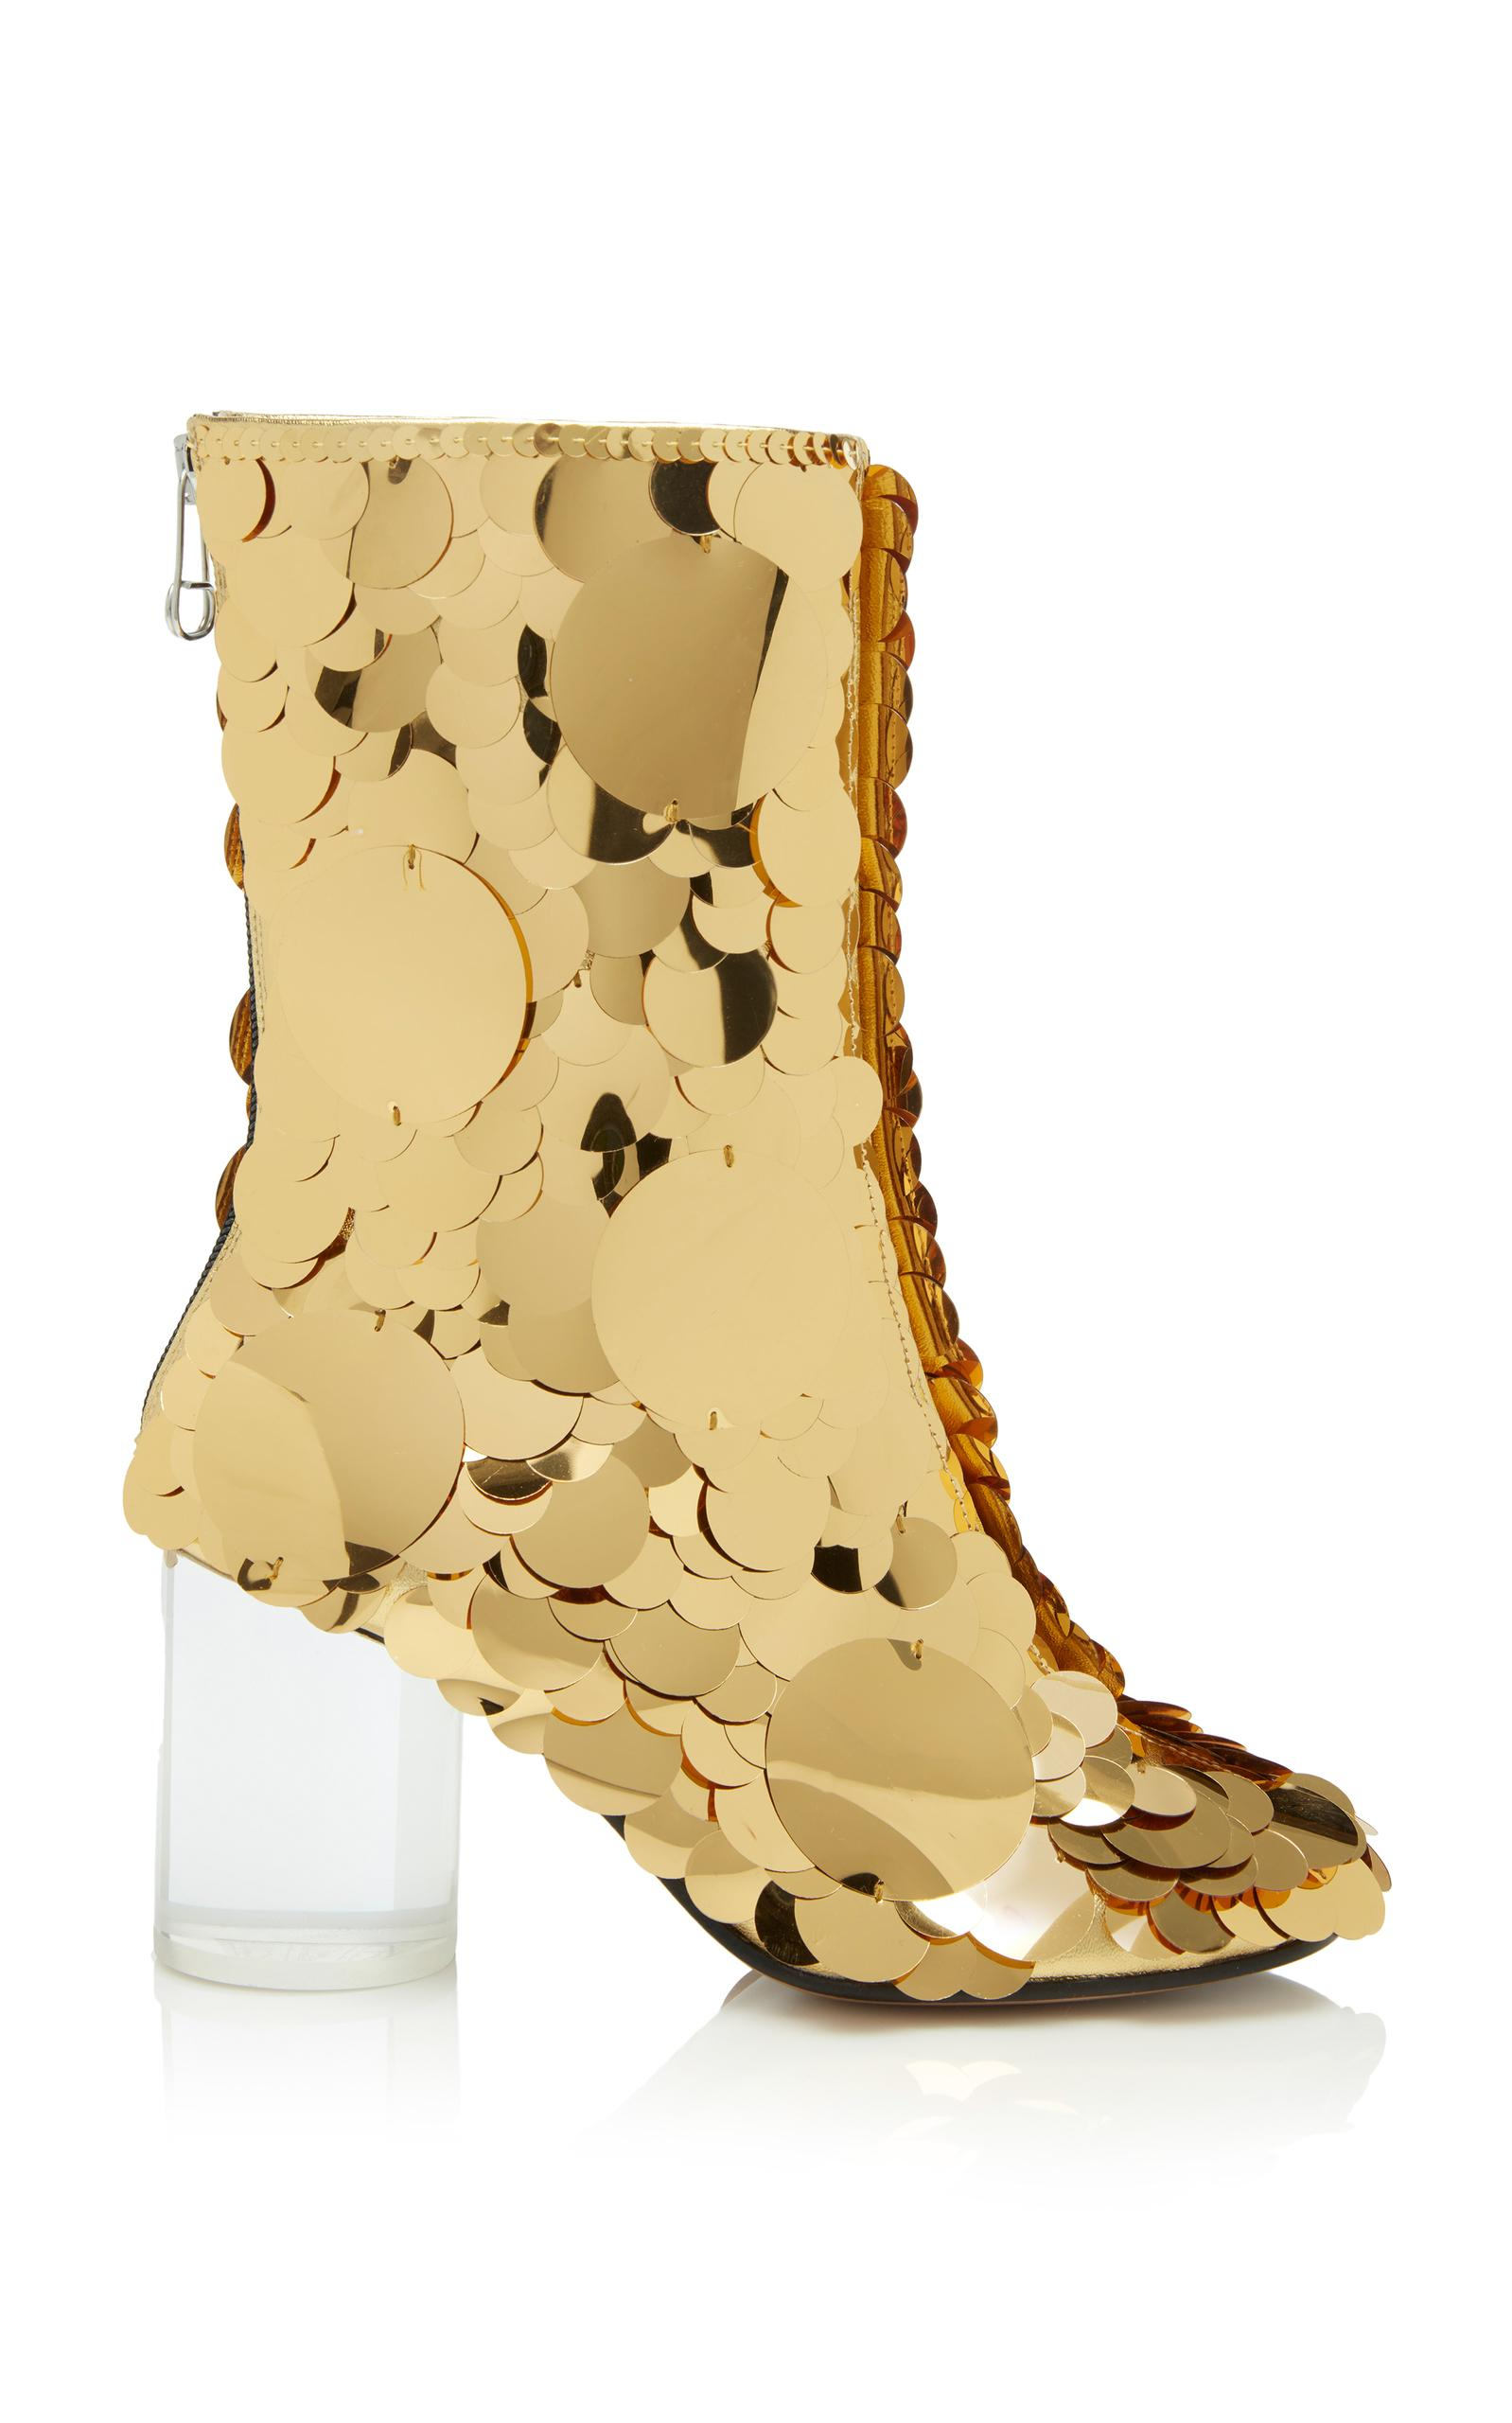 Maison Margiela Sock Paillettes Boot In Gold